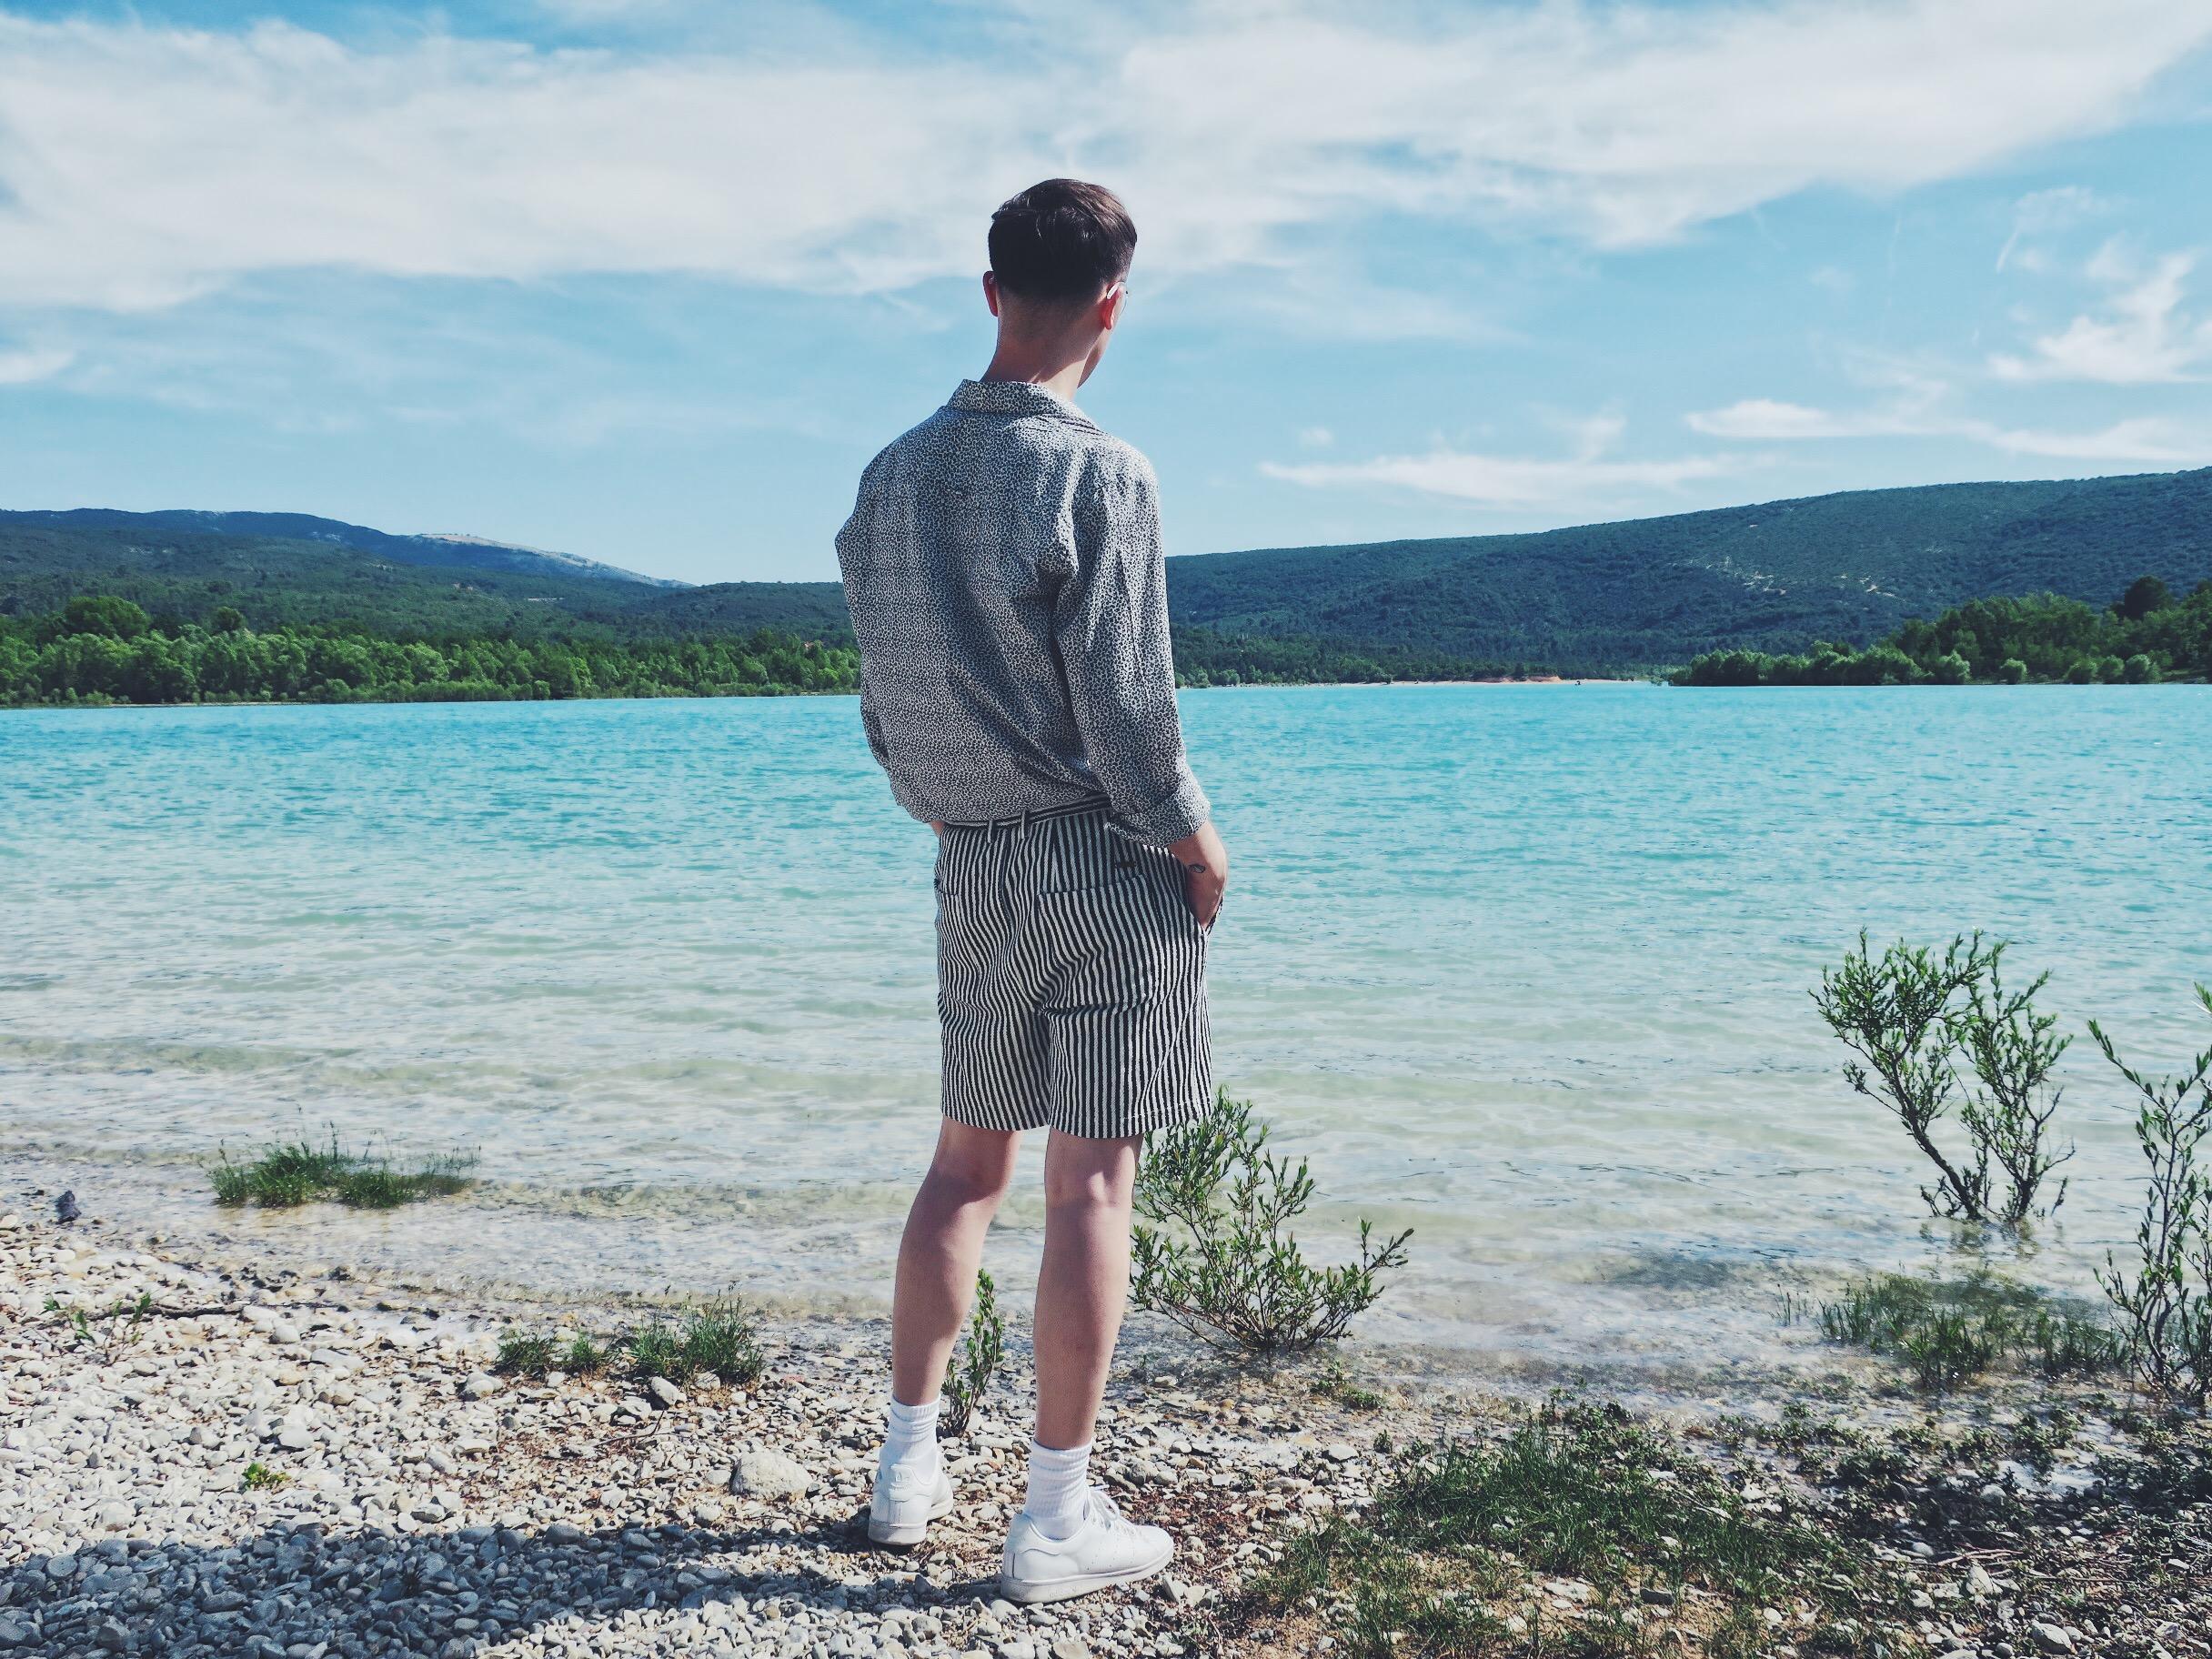 Martinique shirt - Zara shorts - Adidas Stan Smith sneakers